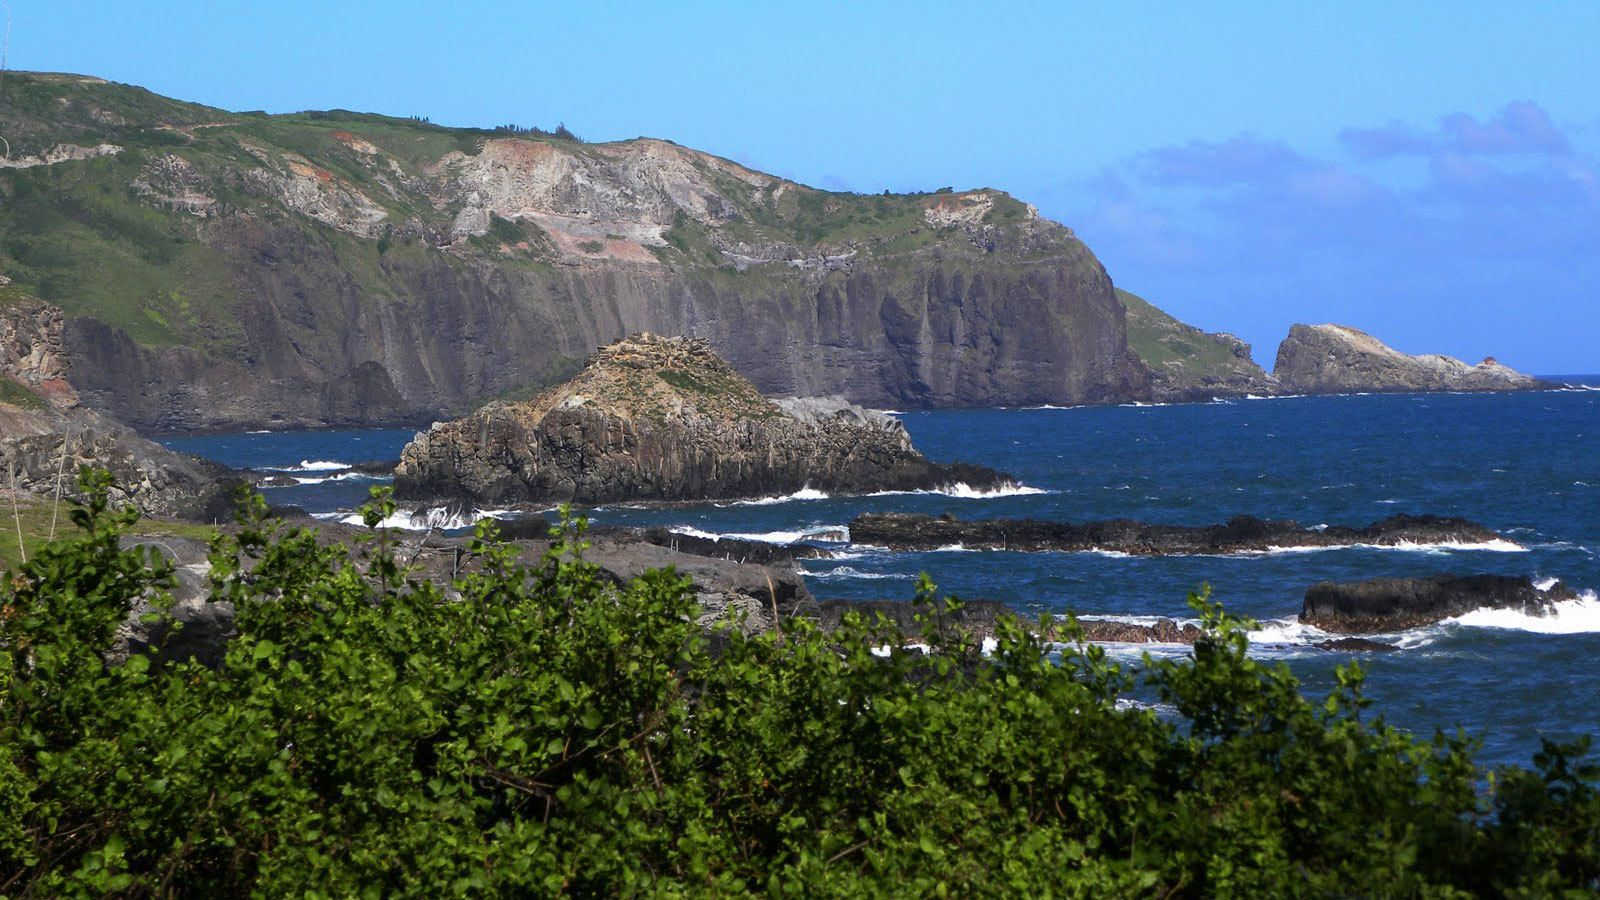 Landscape of the shore line in Maui